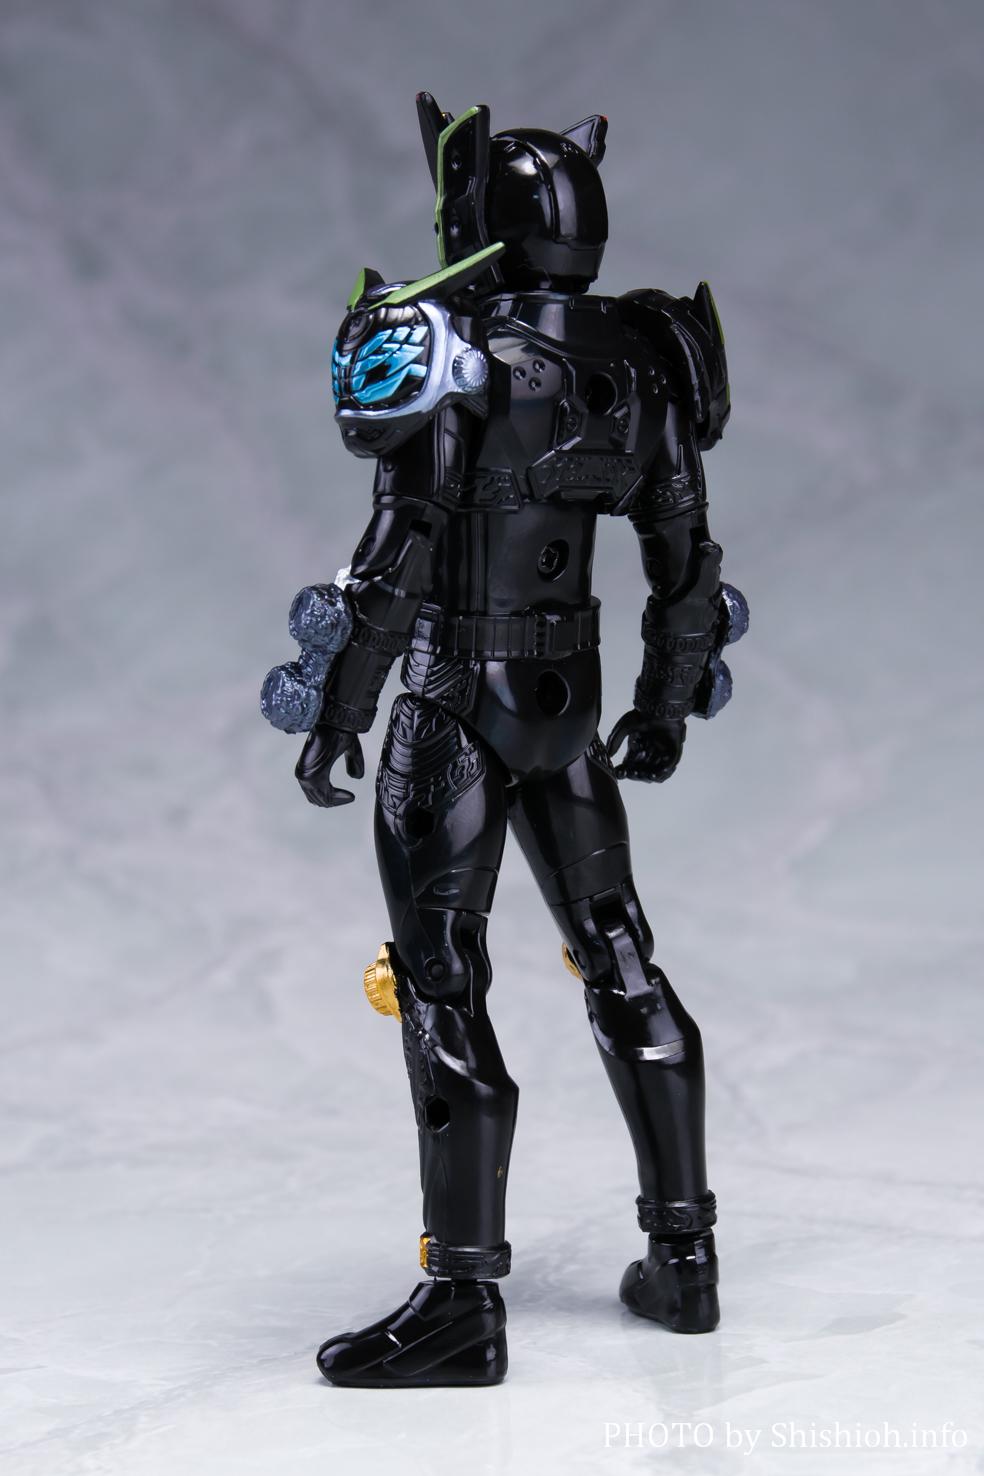 RKF ライダーアーマーシリーズ 仮面ライダージオウトリニティ